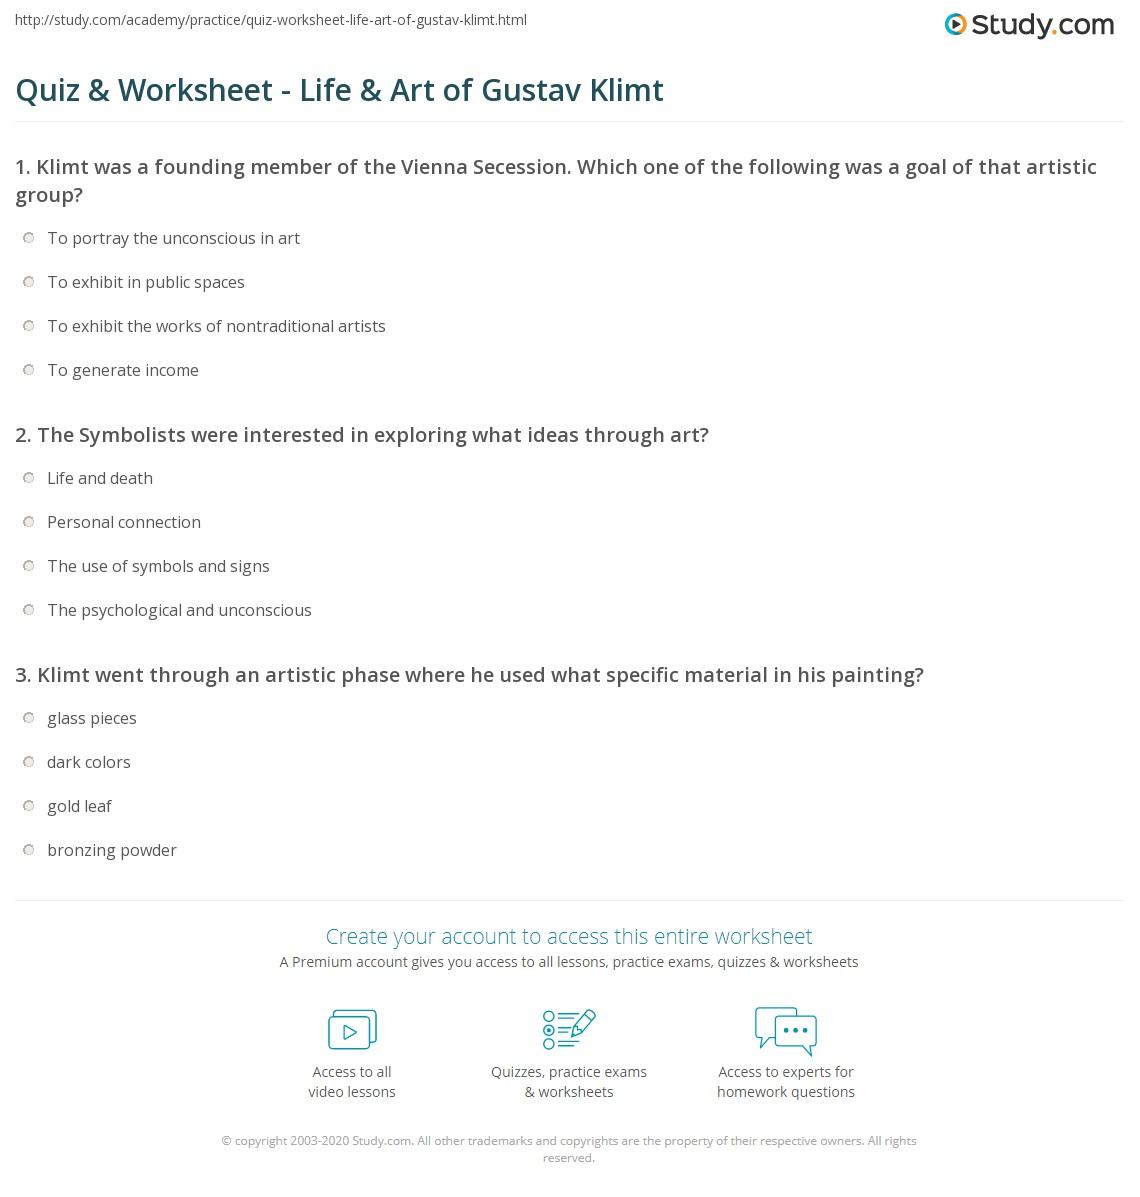 Worksheets Culinary Arts Worksheets culinary arts worksheets sharebrowse collection of sharebrowse